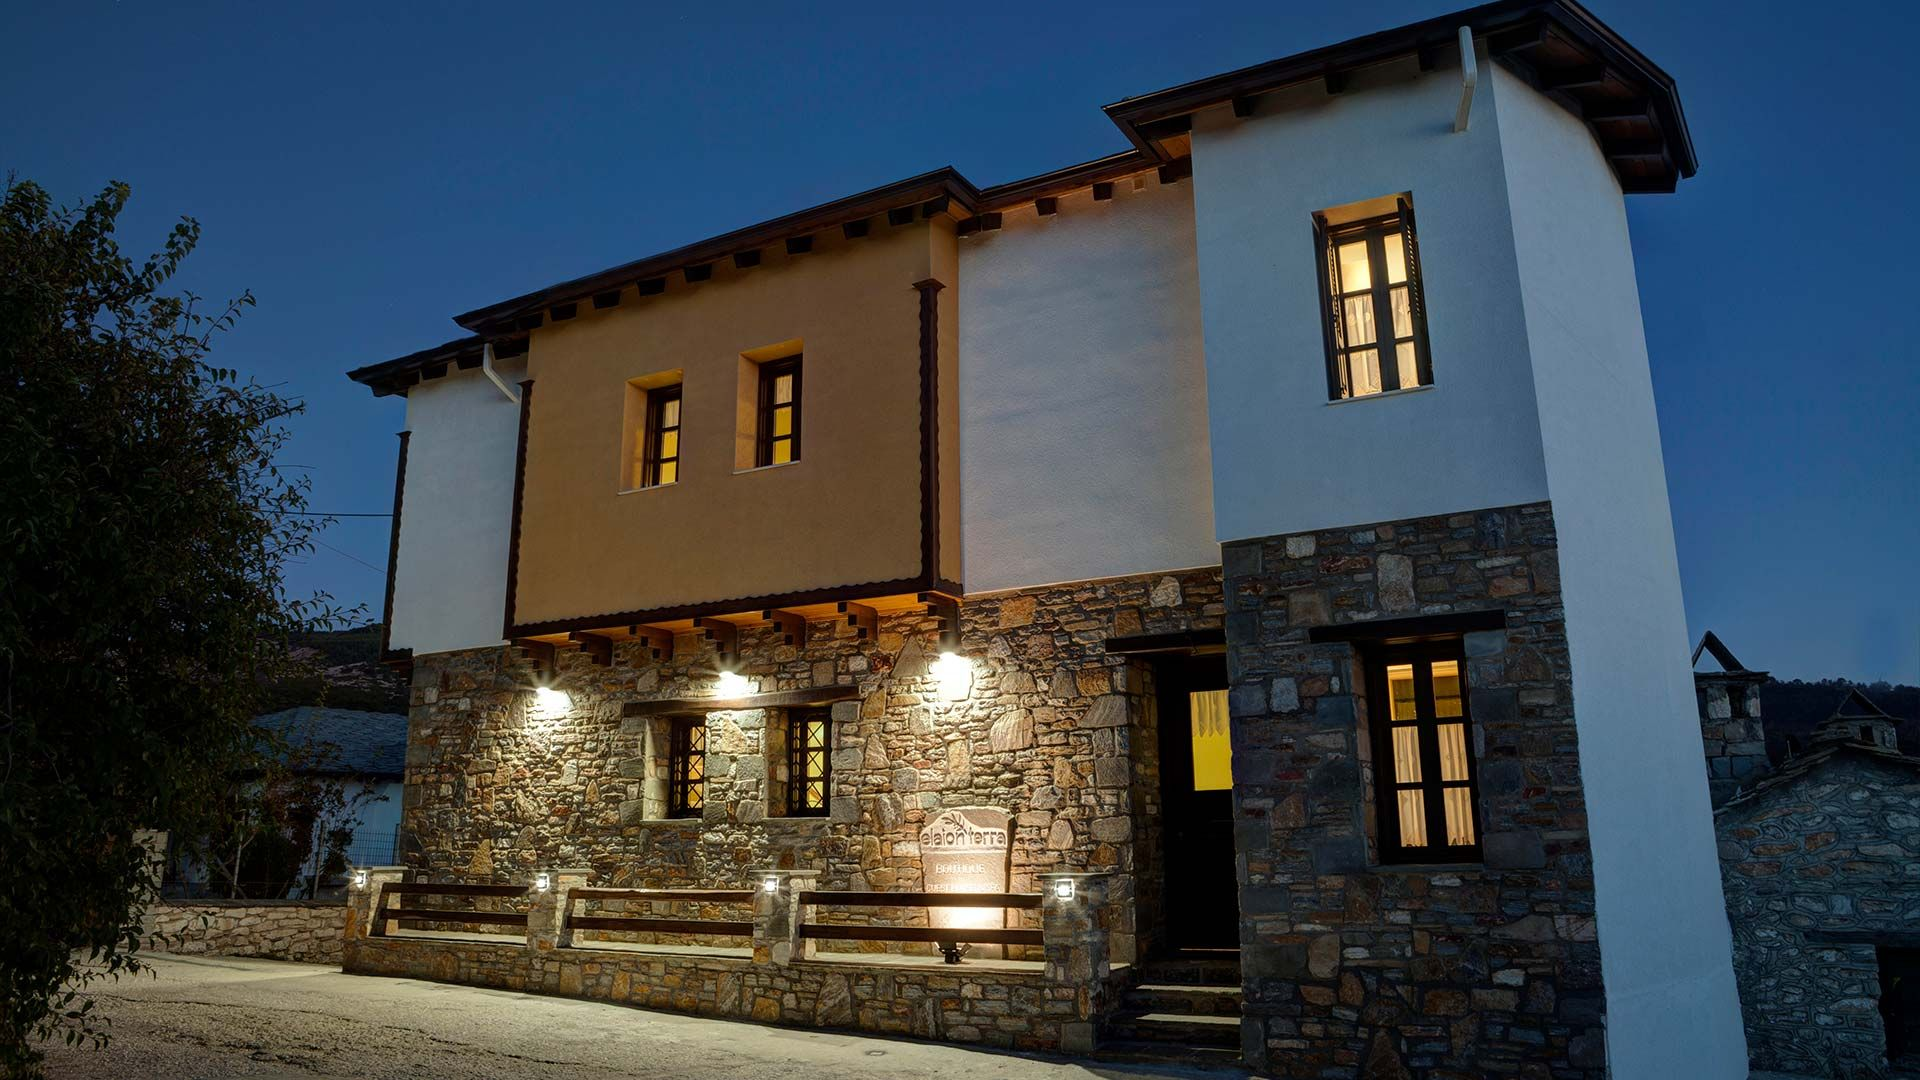 Elaion Terra Boutique Guesthouse - Θάσος ✦ 3 Ημέρες (2 Διανυκτερεύσεις) ✦ 2 άτομα ✦ Πρωινό ✦ 01/07/2021 έως 31/08/2021 ✦ Free WiFi